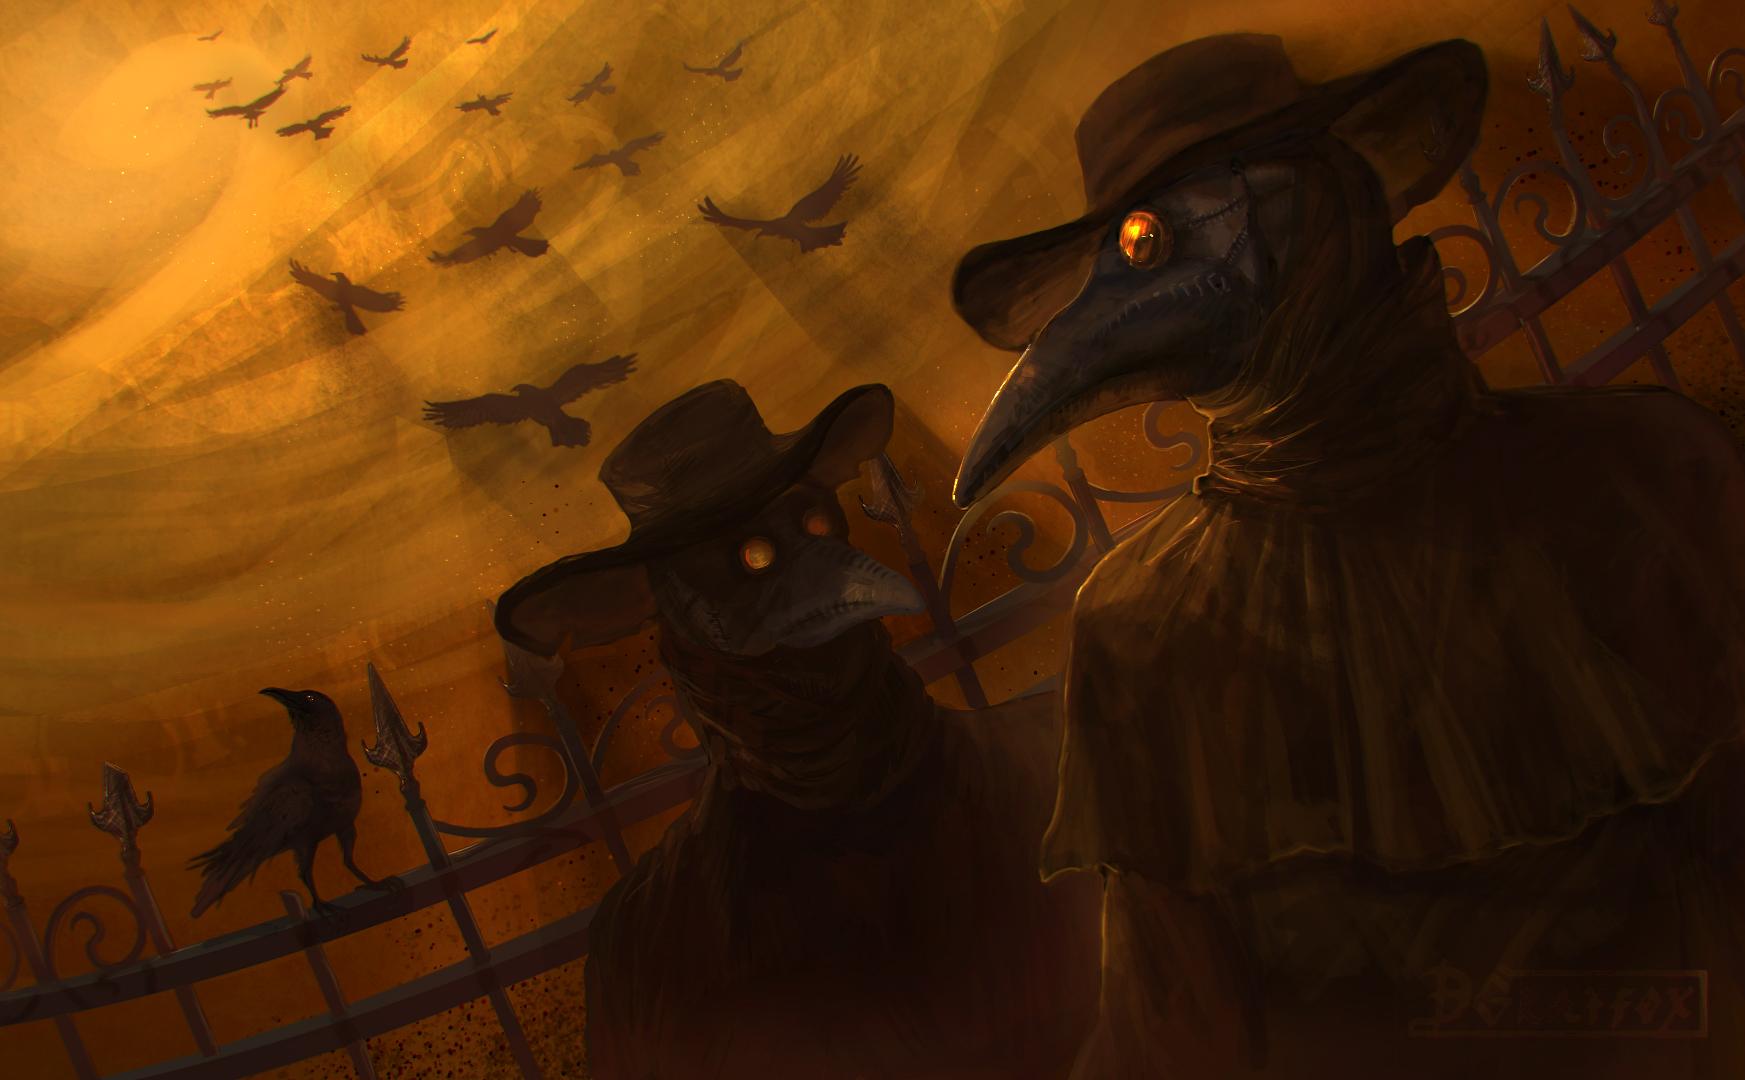 Plague doctor by DGrayfox